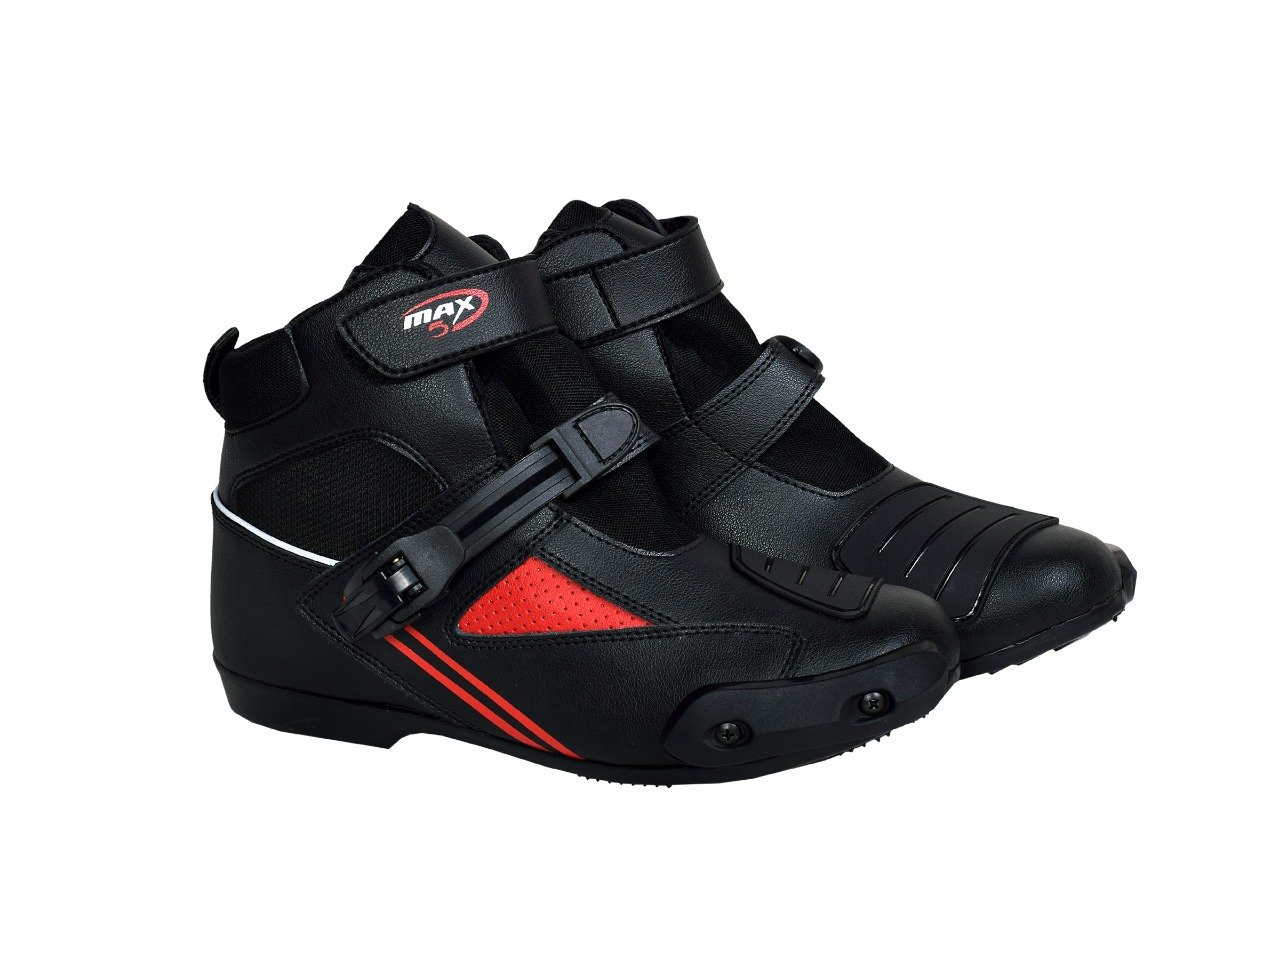 41 EU// 7UK MAXFIVE Motorrad Stiefel Touren Kurz Koppel St/ädtisch Rennen Motorrad Leder Boot Speedo Schuhe Rot